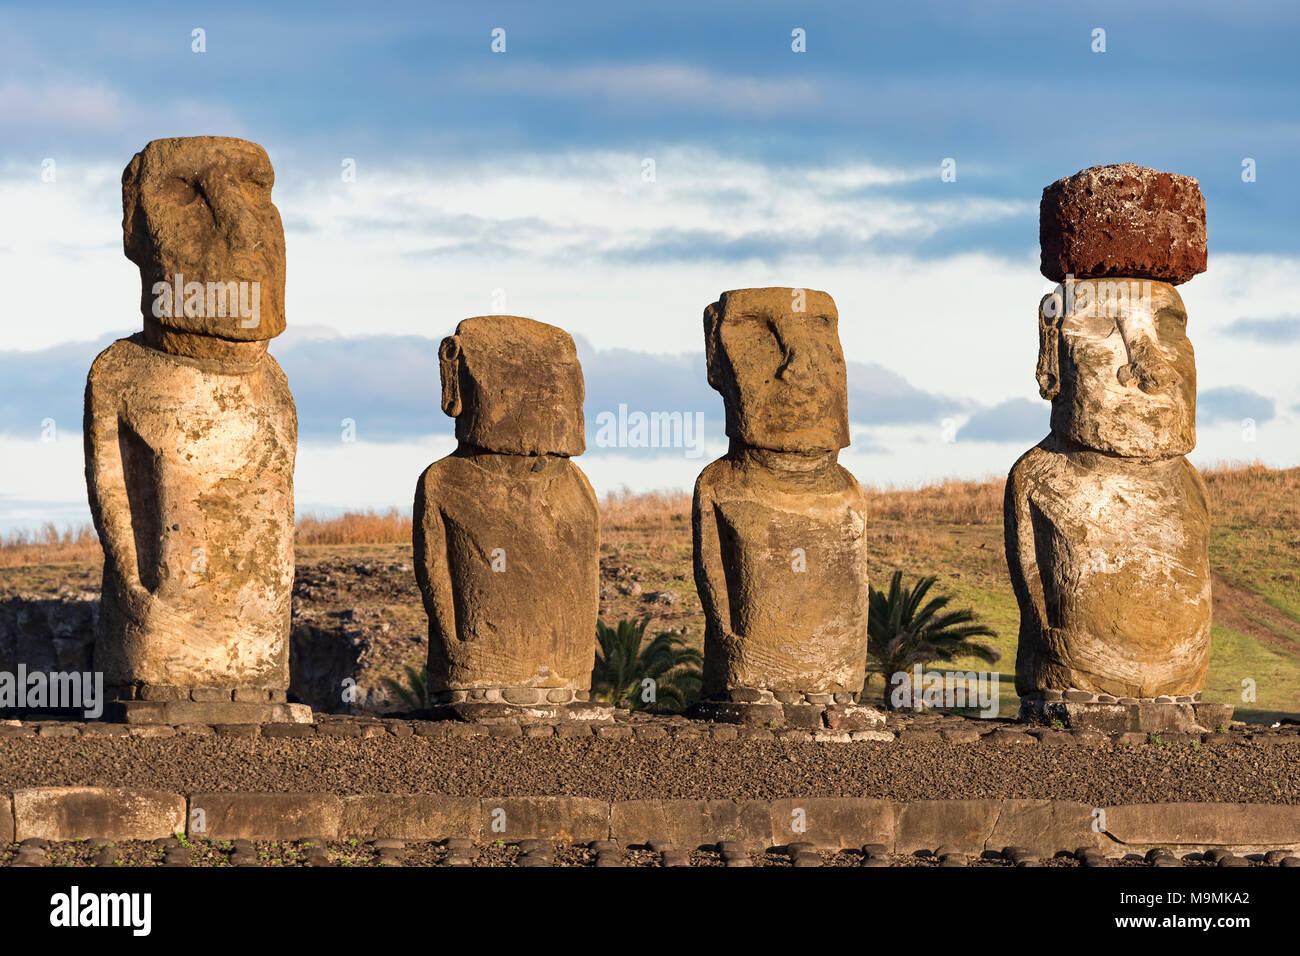 Figuras de piedra, grupo de moais, Ahu Tongariki, Isla de Pascua, Chile Imagen De Stock